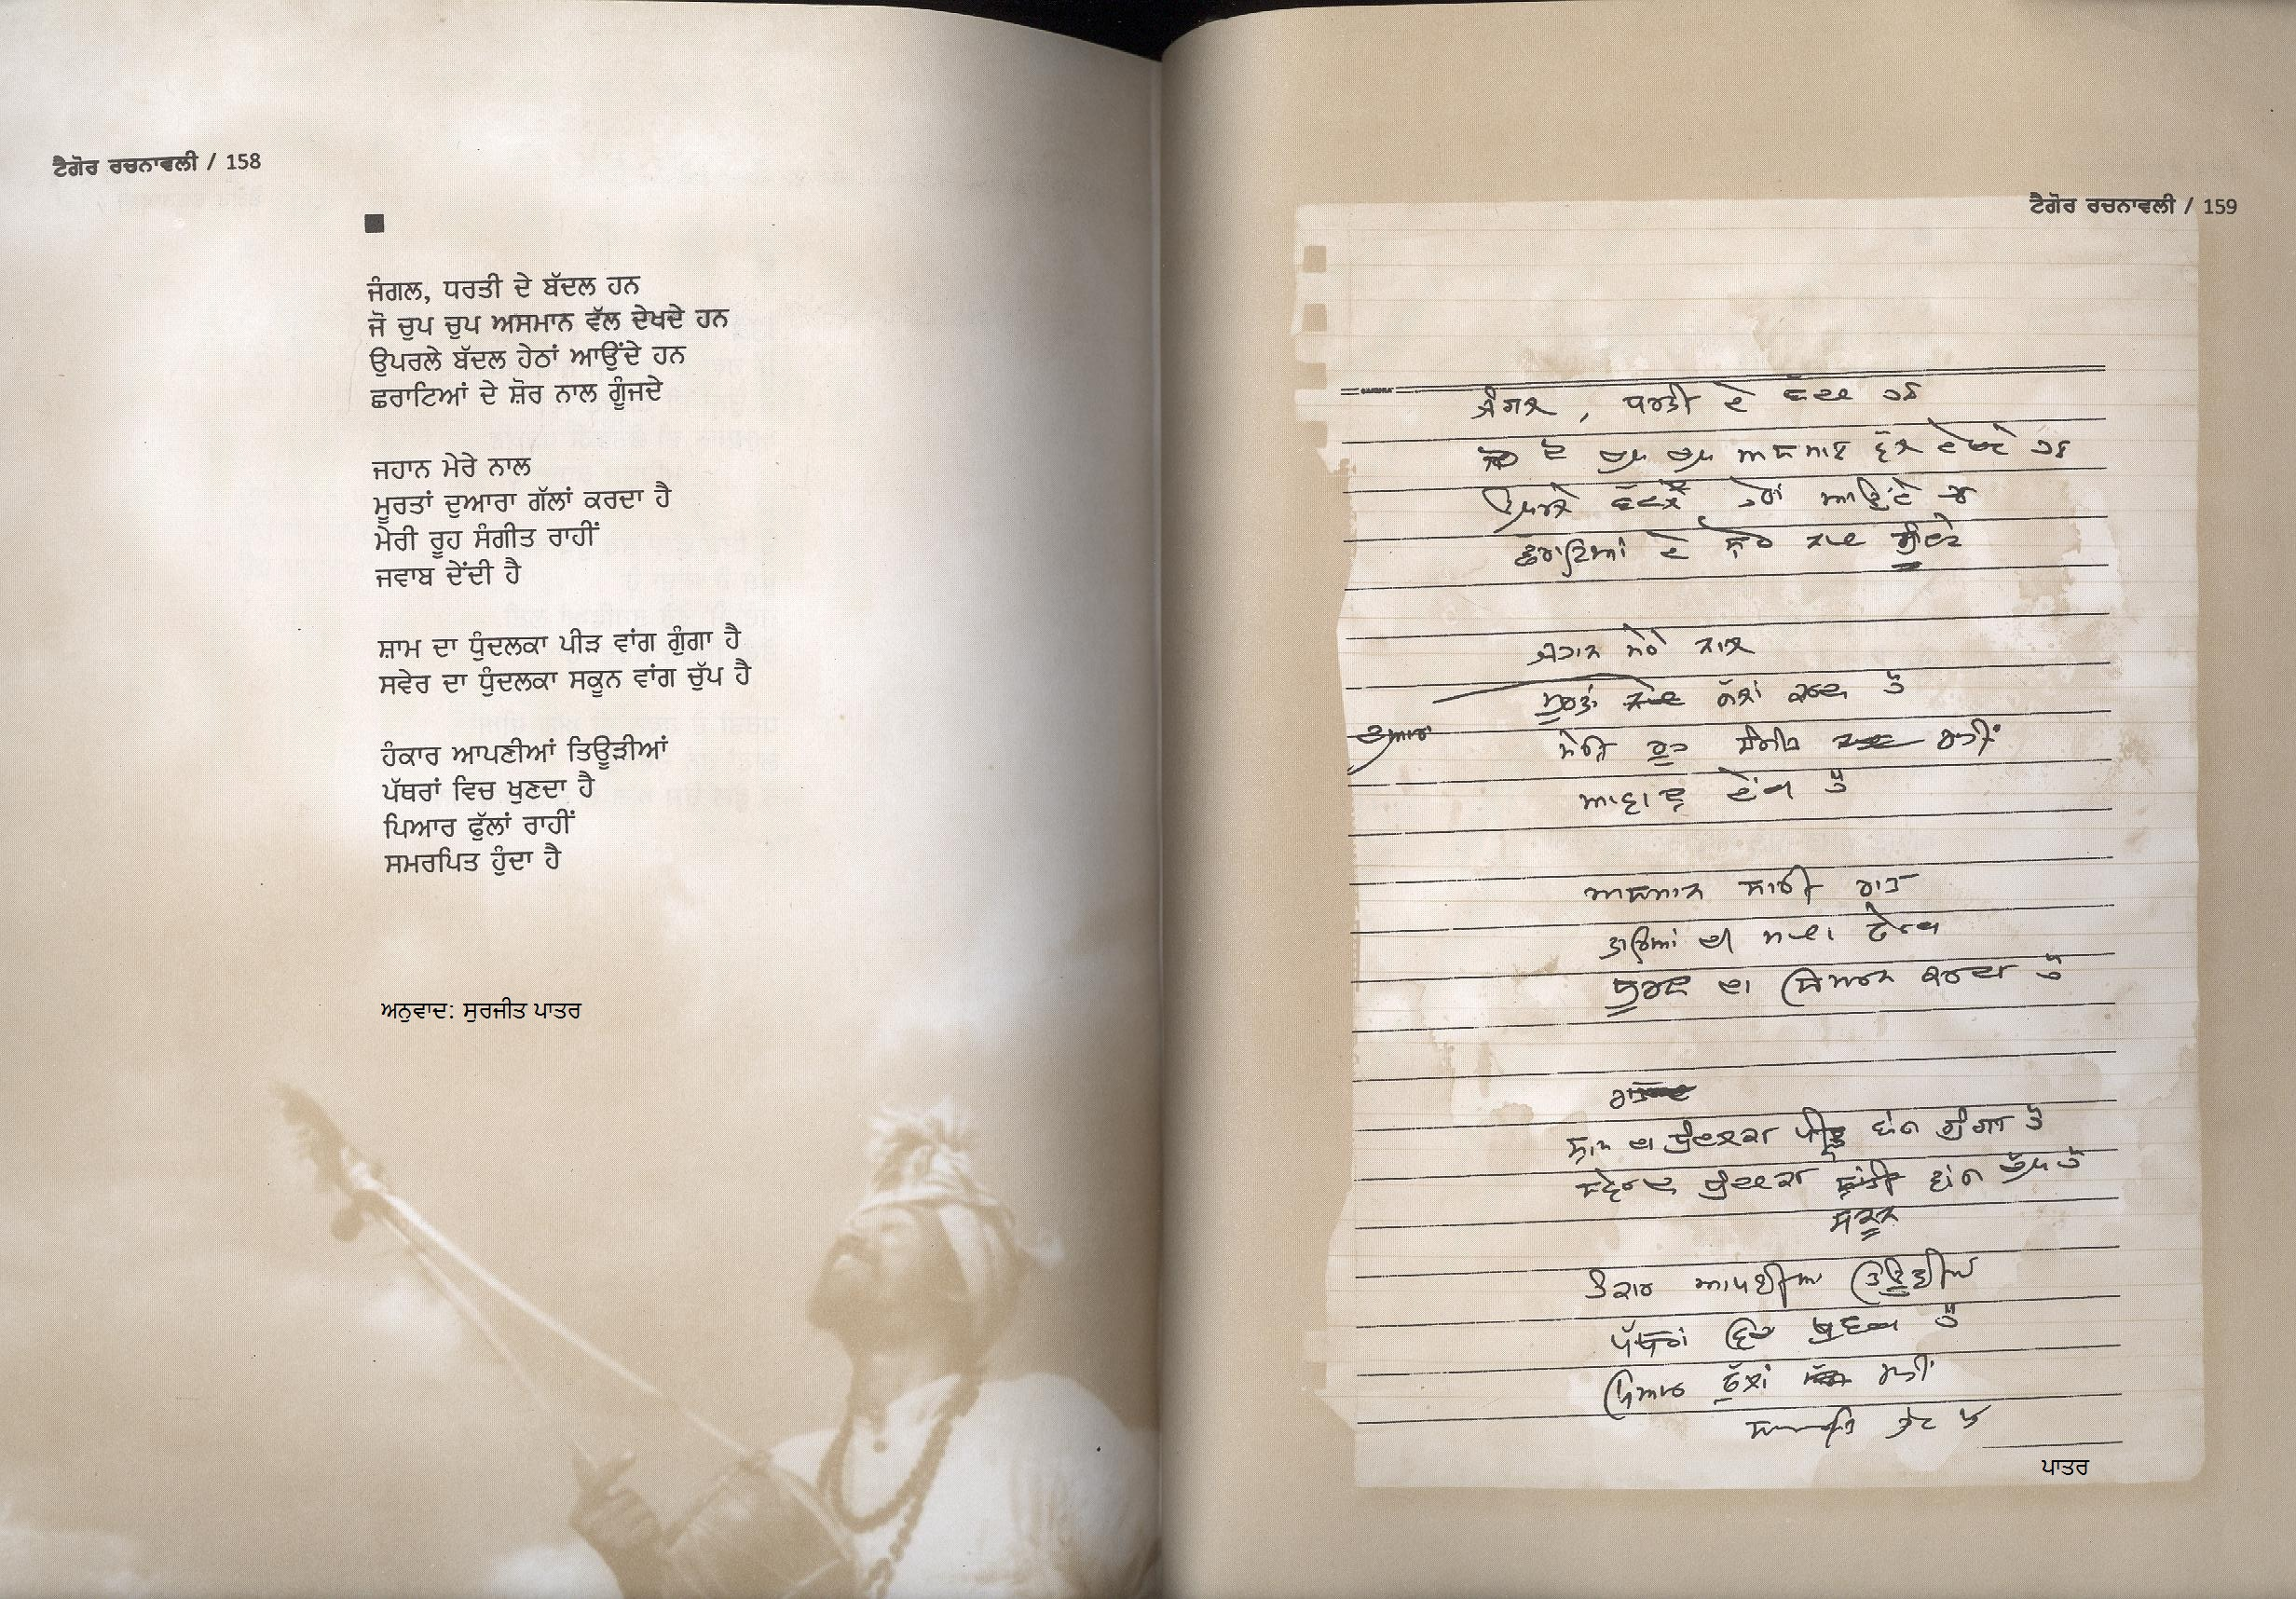 Surjeet Patar handwriting